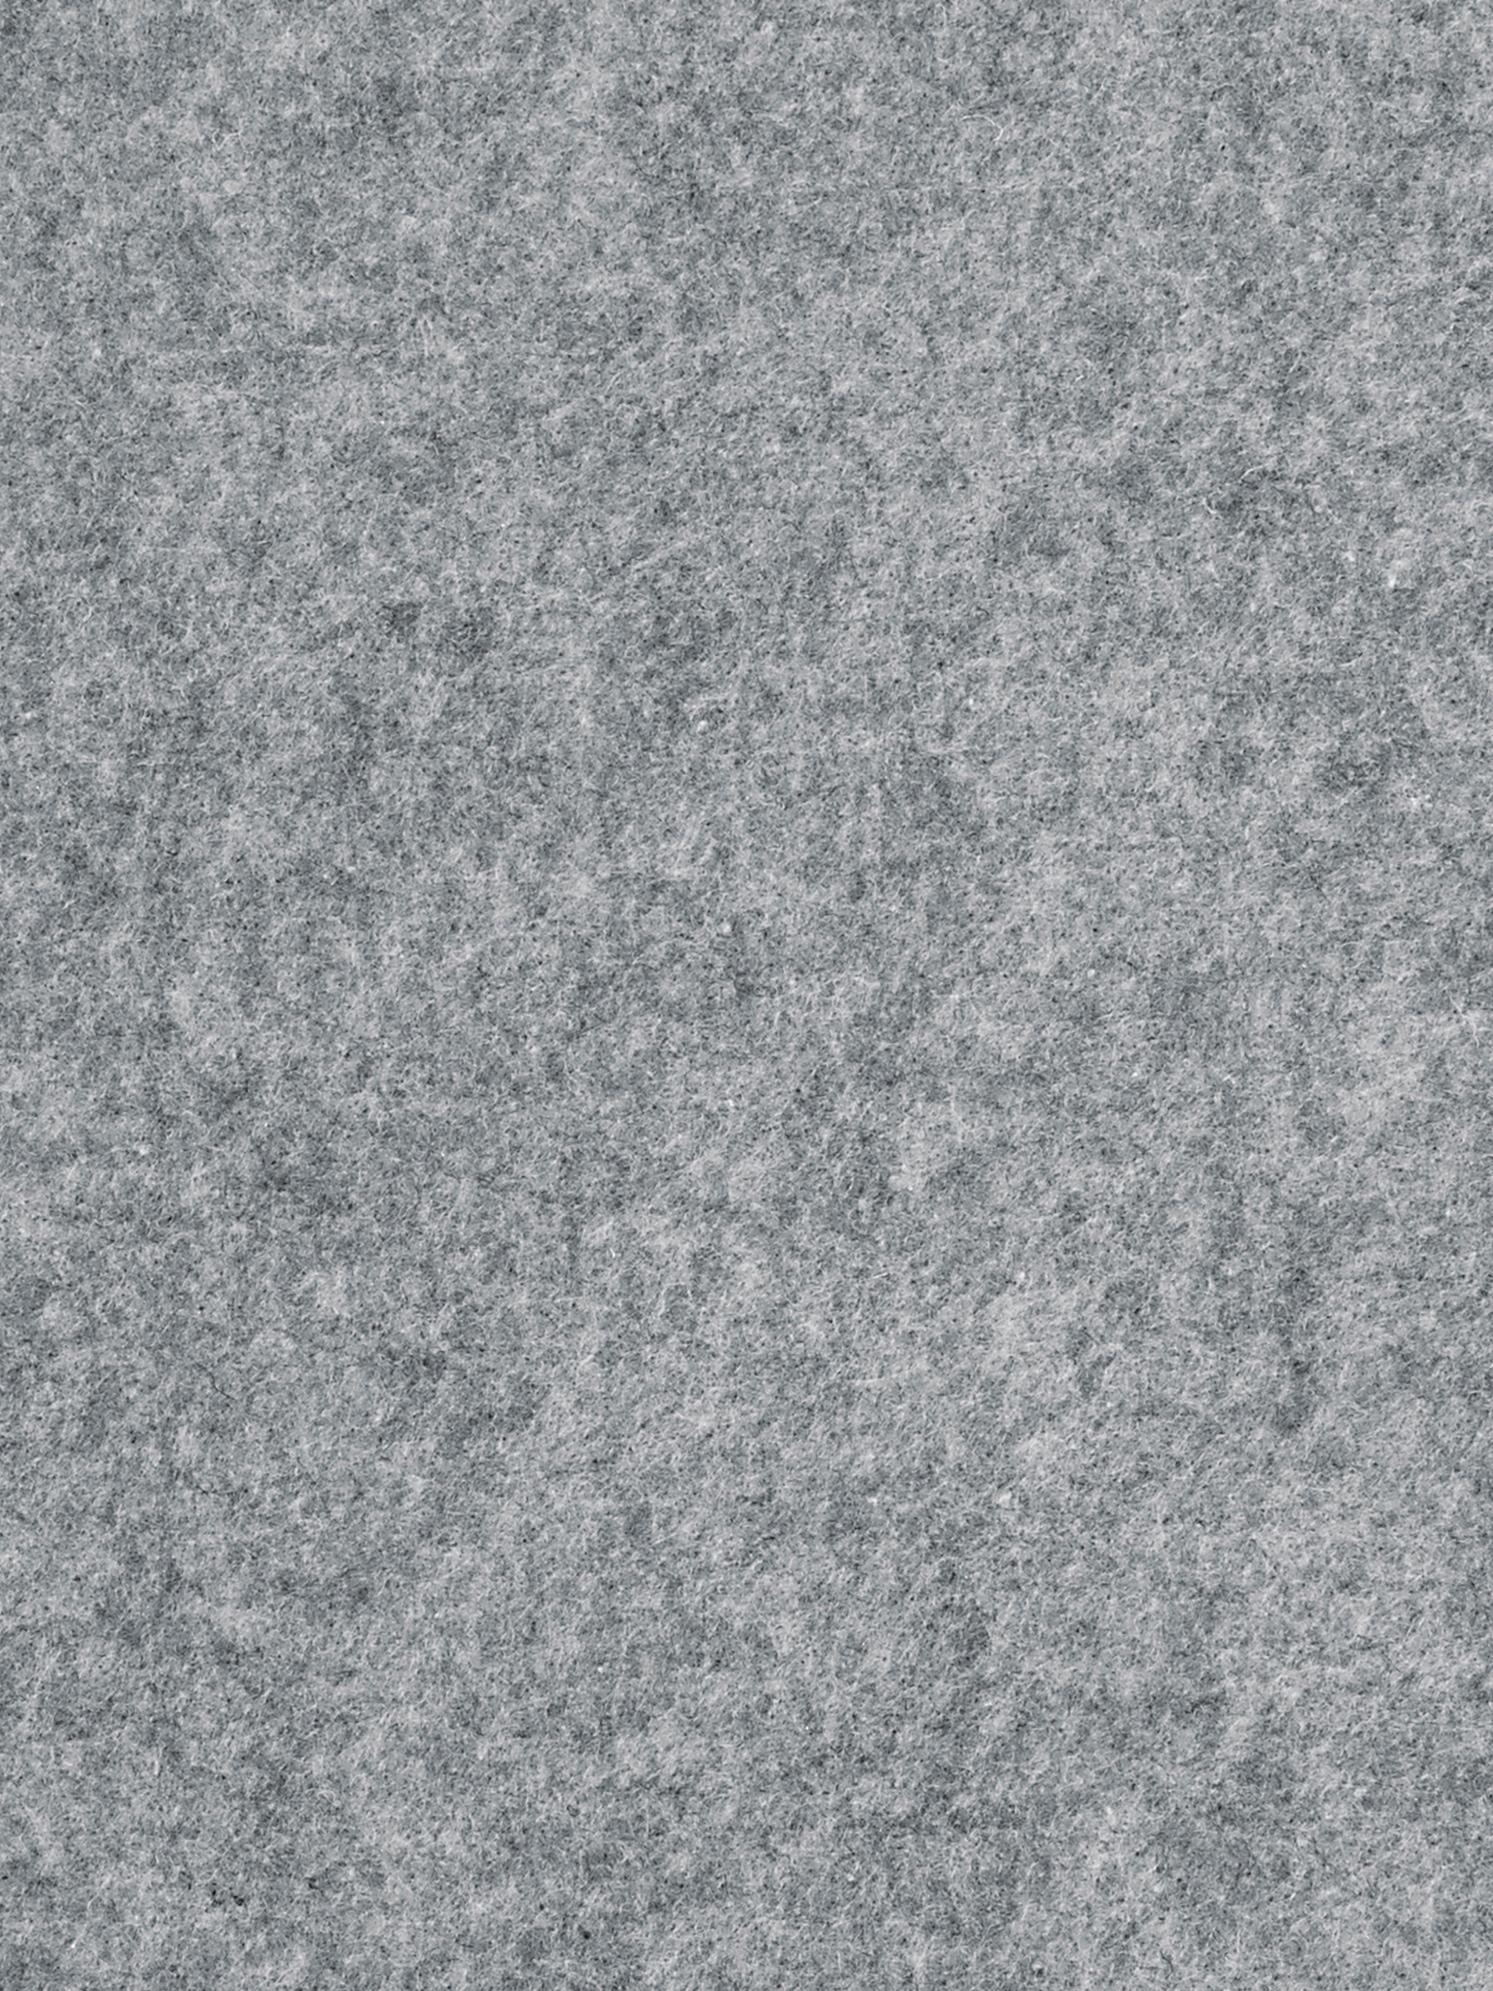 Filz-Sitzauflagen Avaro Square, 4 Stück, Grau, 35 x 35 cm